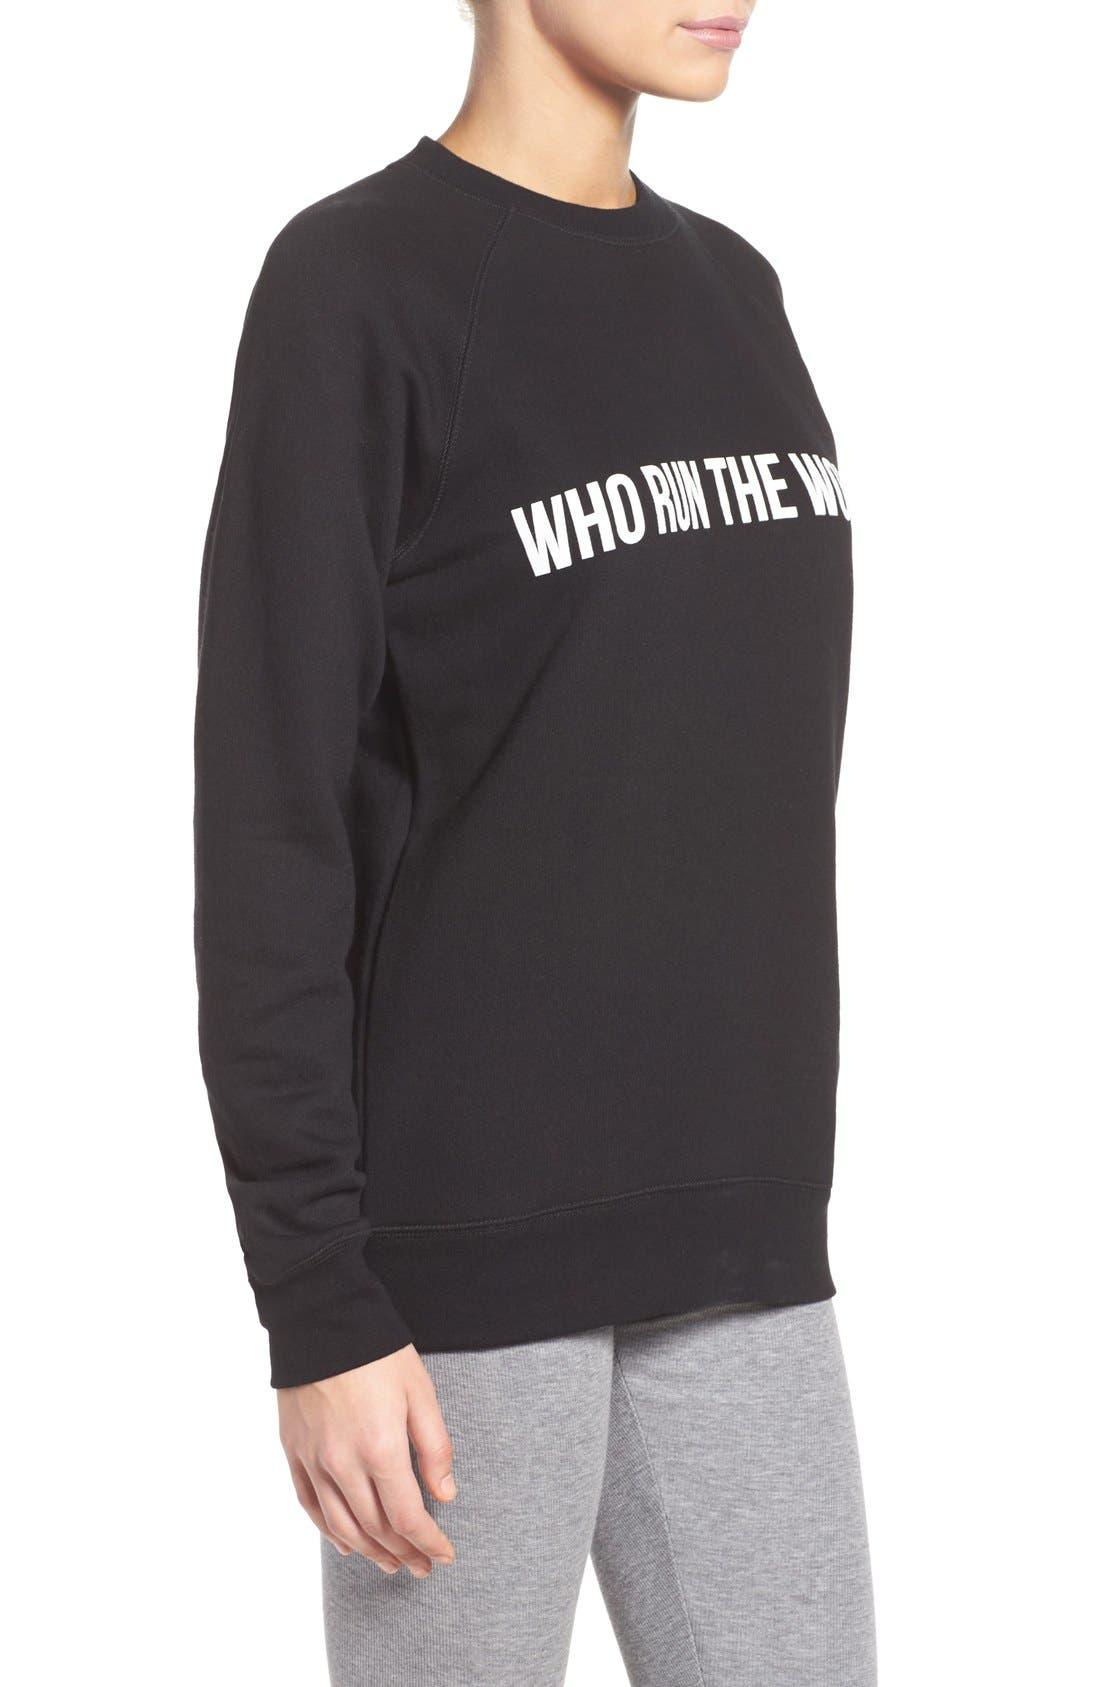 Who Run the World Sweatshirt,                             Alternate thumbnail 7, color,